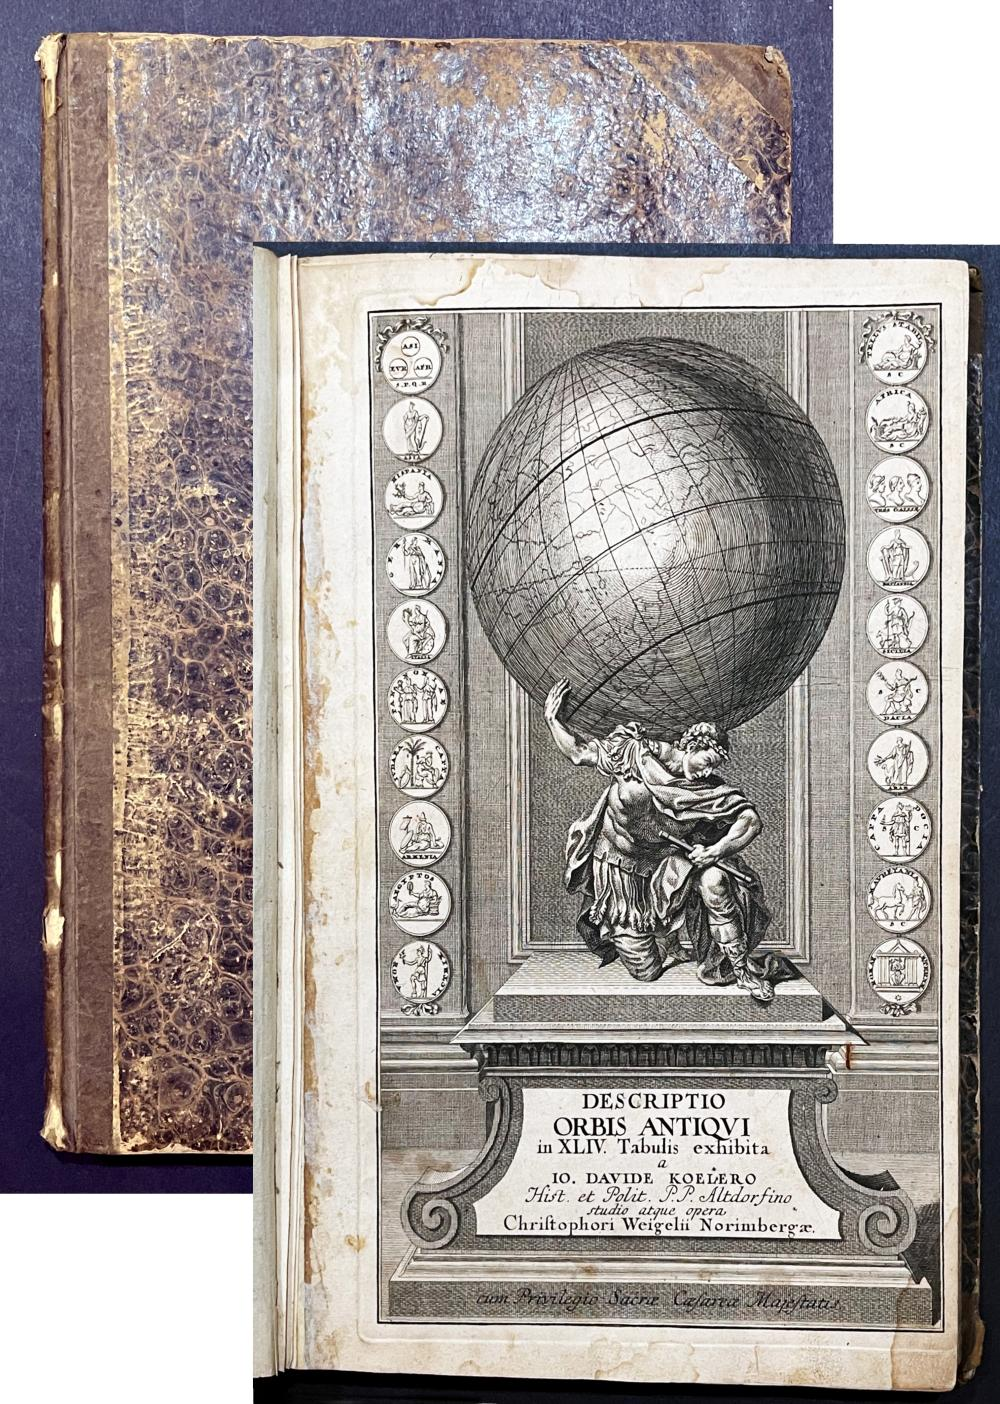 Johann David Koehler: Descriptio Orbis Antiqui in XLIV Tabulis, 1720